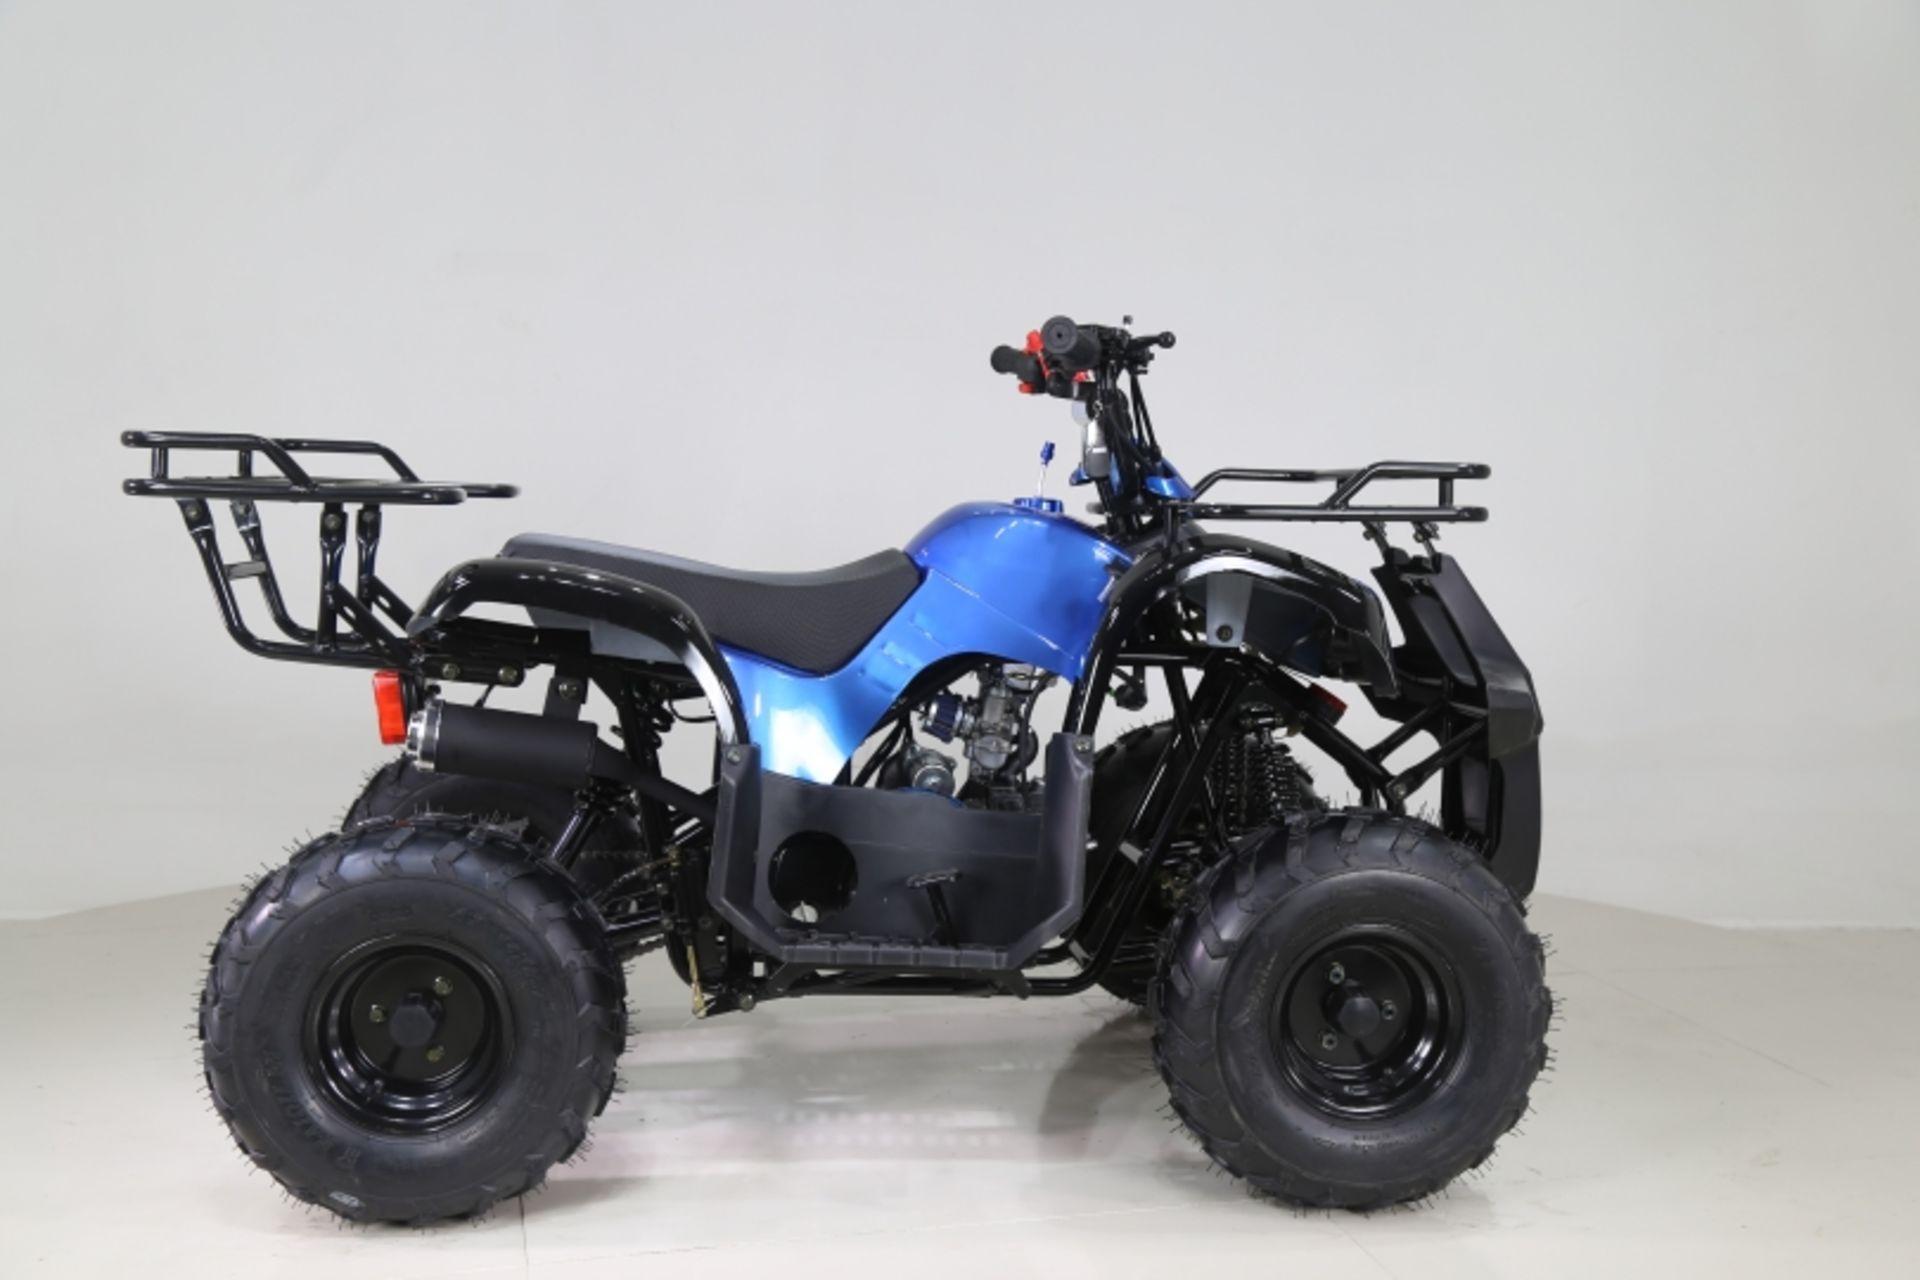 Lot 23000 - V Brand New 125cc Condo 4 Stroke Quad Bike With Front & Rear Racks - Air Cooled 4 Stroke Honda